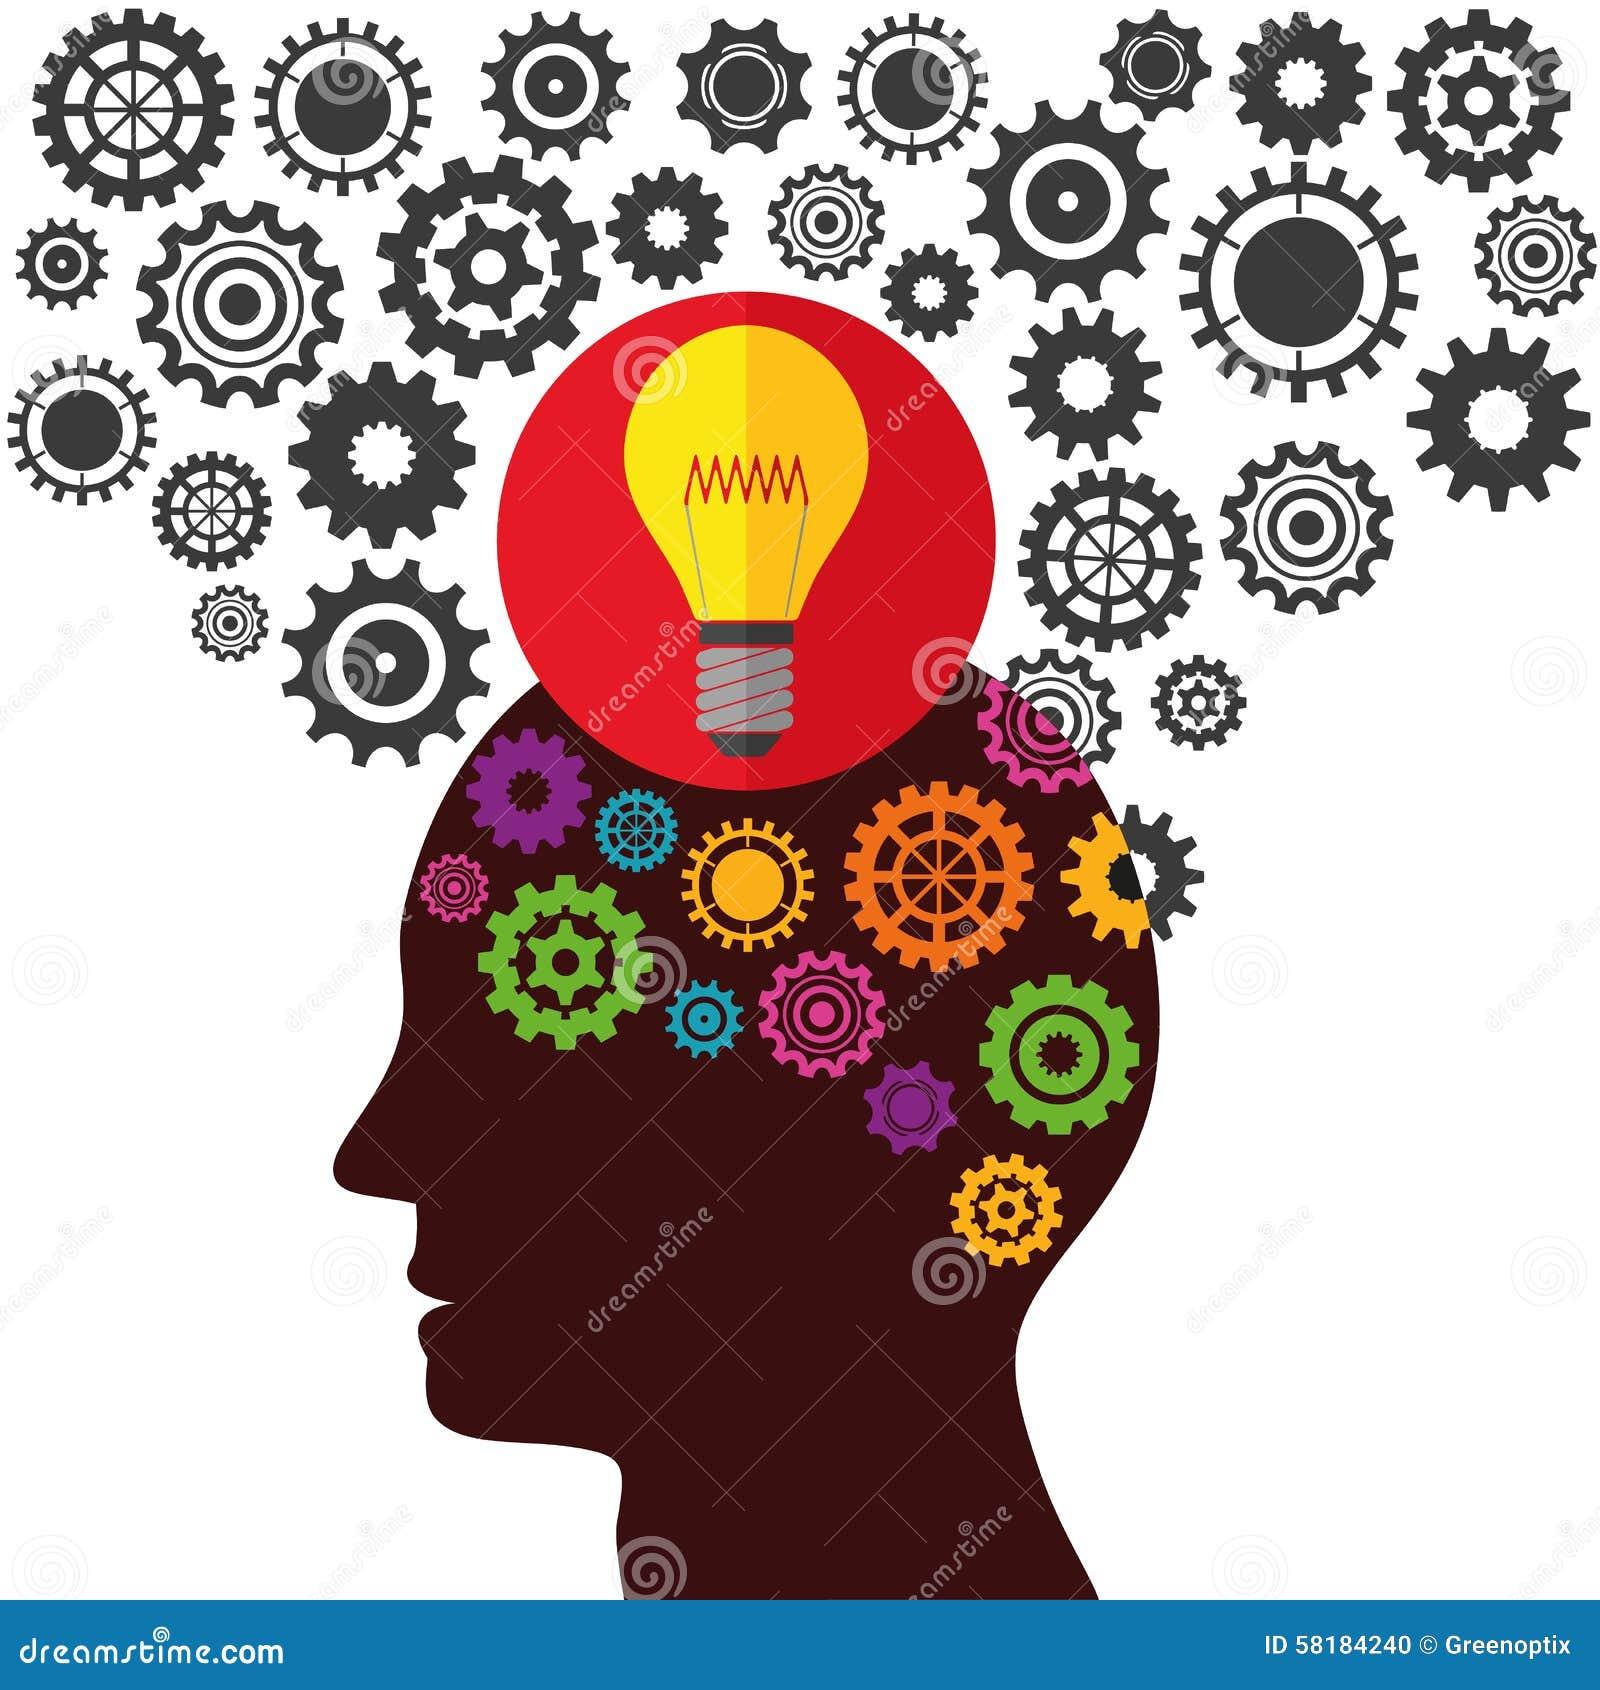 Illustrations-Vektor-Grafik-Kreativität Und Ideen Vektor Abbildung ...